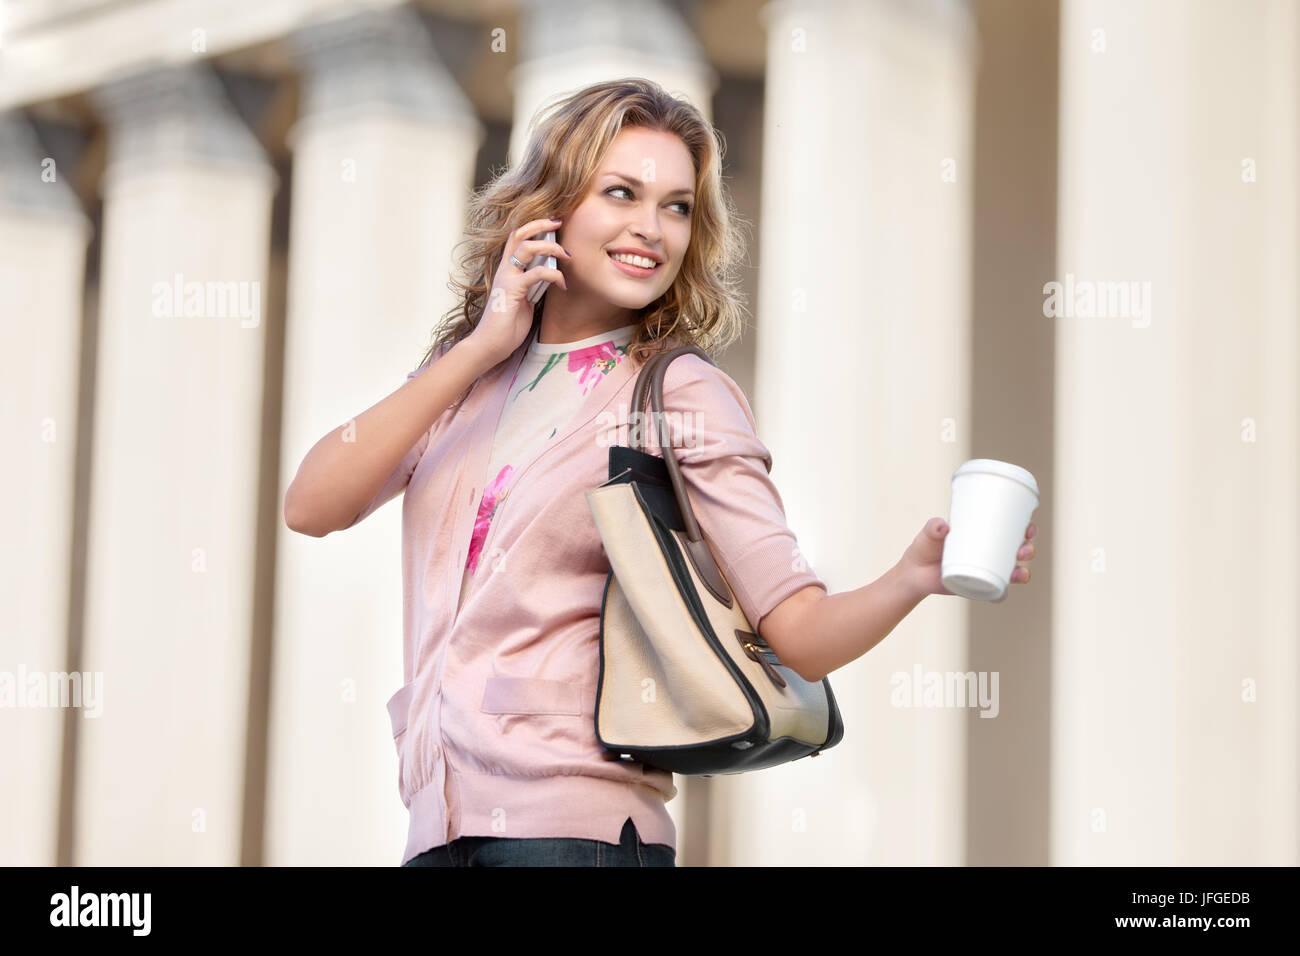 Flirt di caffè. Immagini Stock